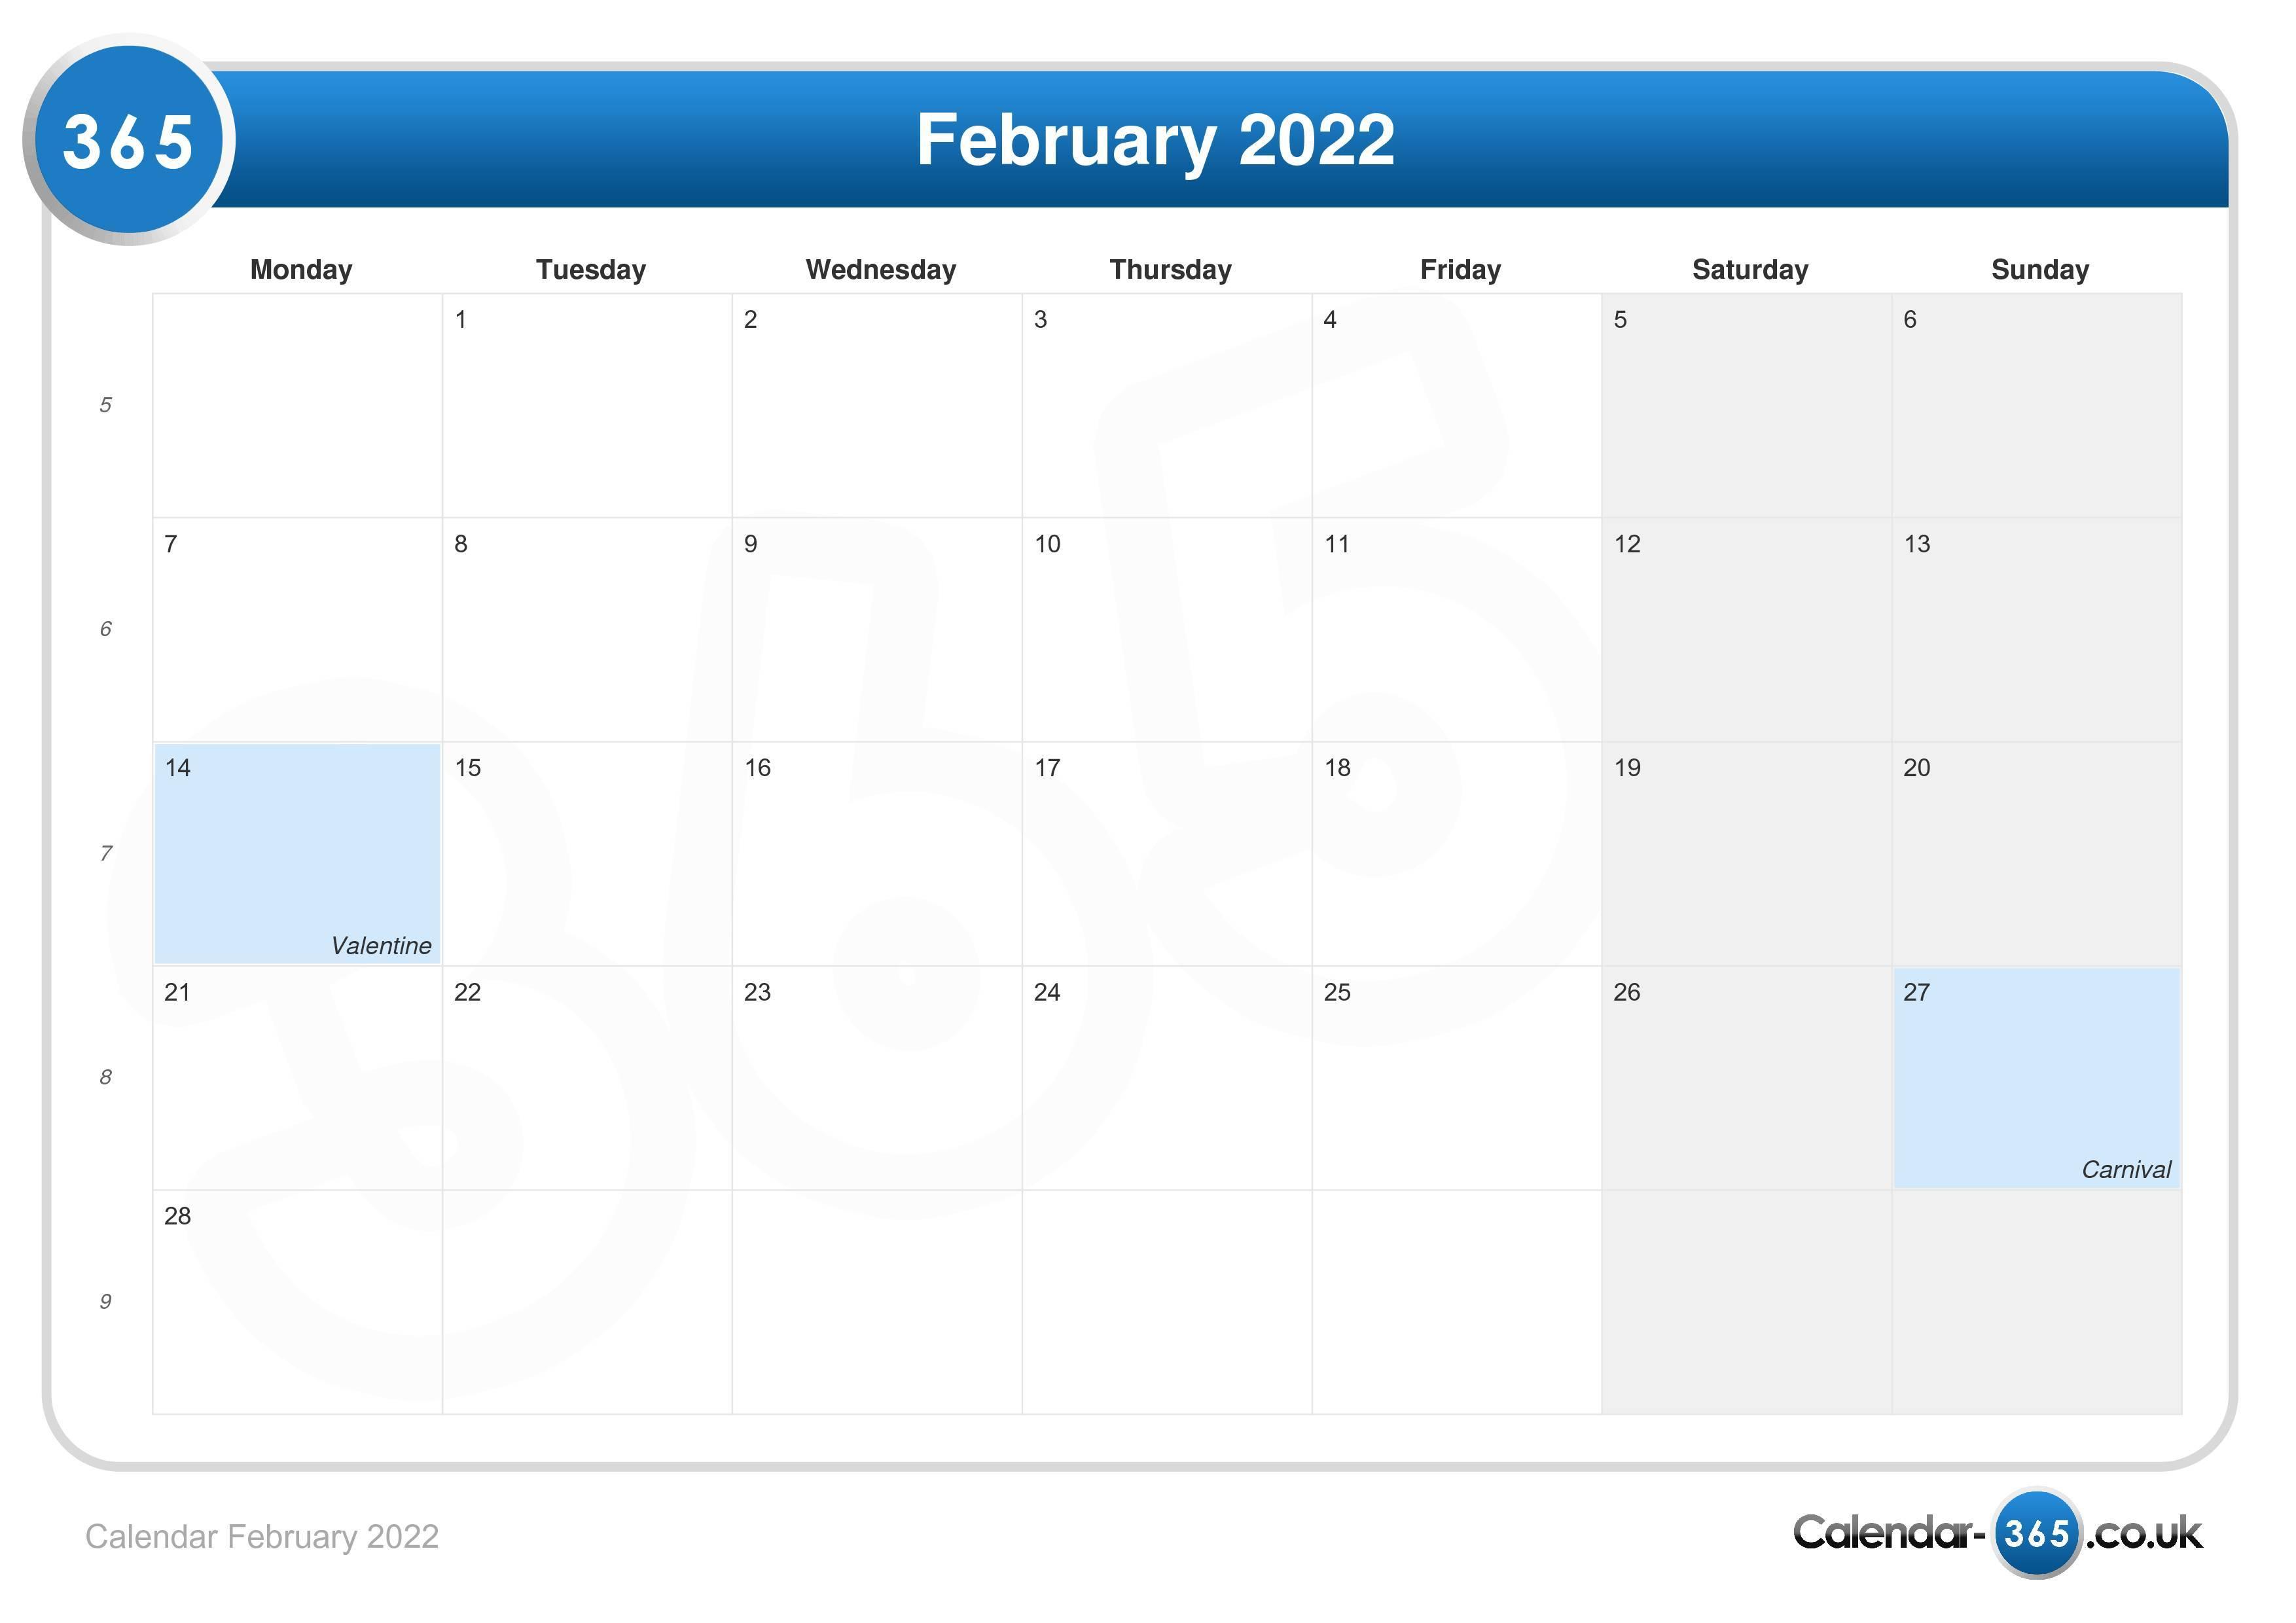 Uf Summer 2022 Calendar.Calendar February 2022